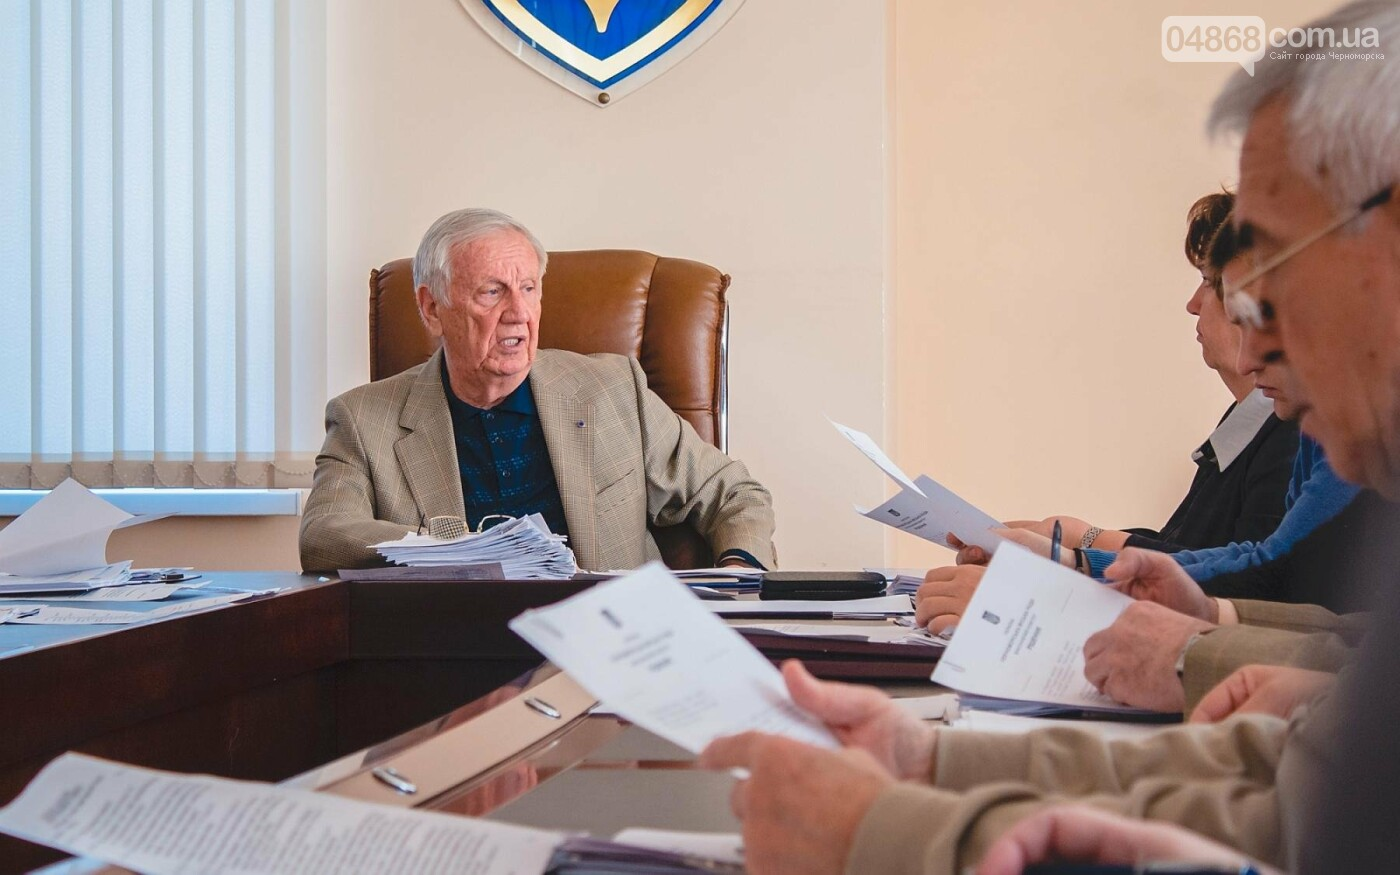 План благоустройства и мероприятий ко Дню рождения Черноморска принят на заседании исполкома, фото-12